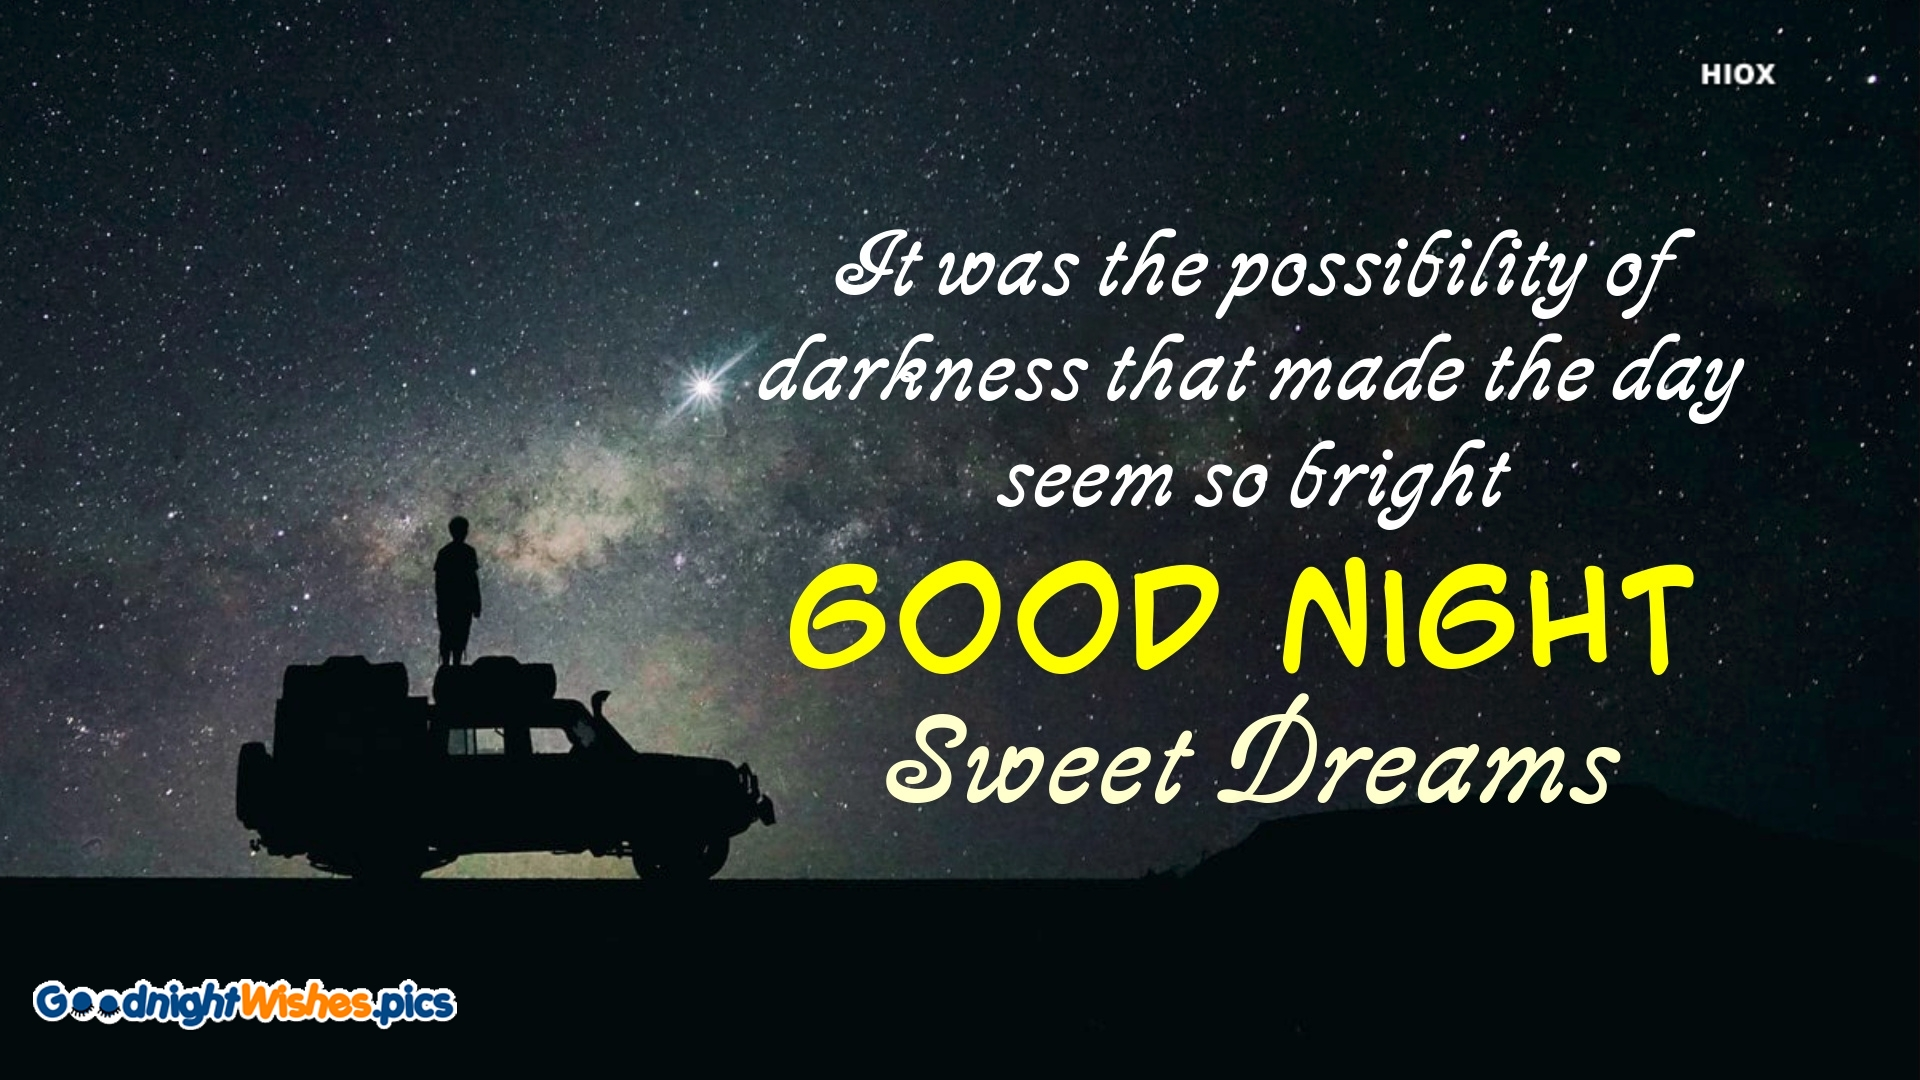 Good Night Motivational Quote Image